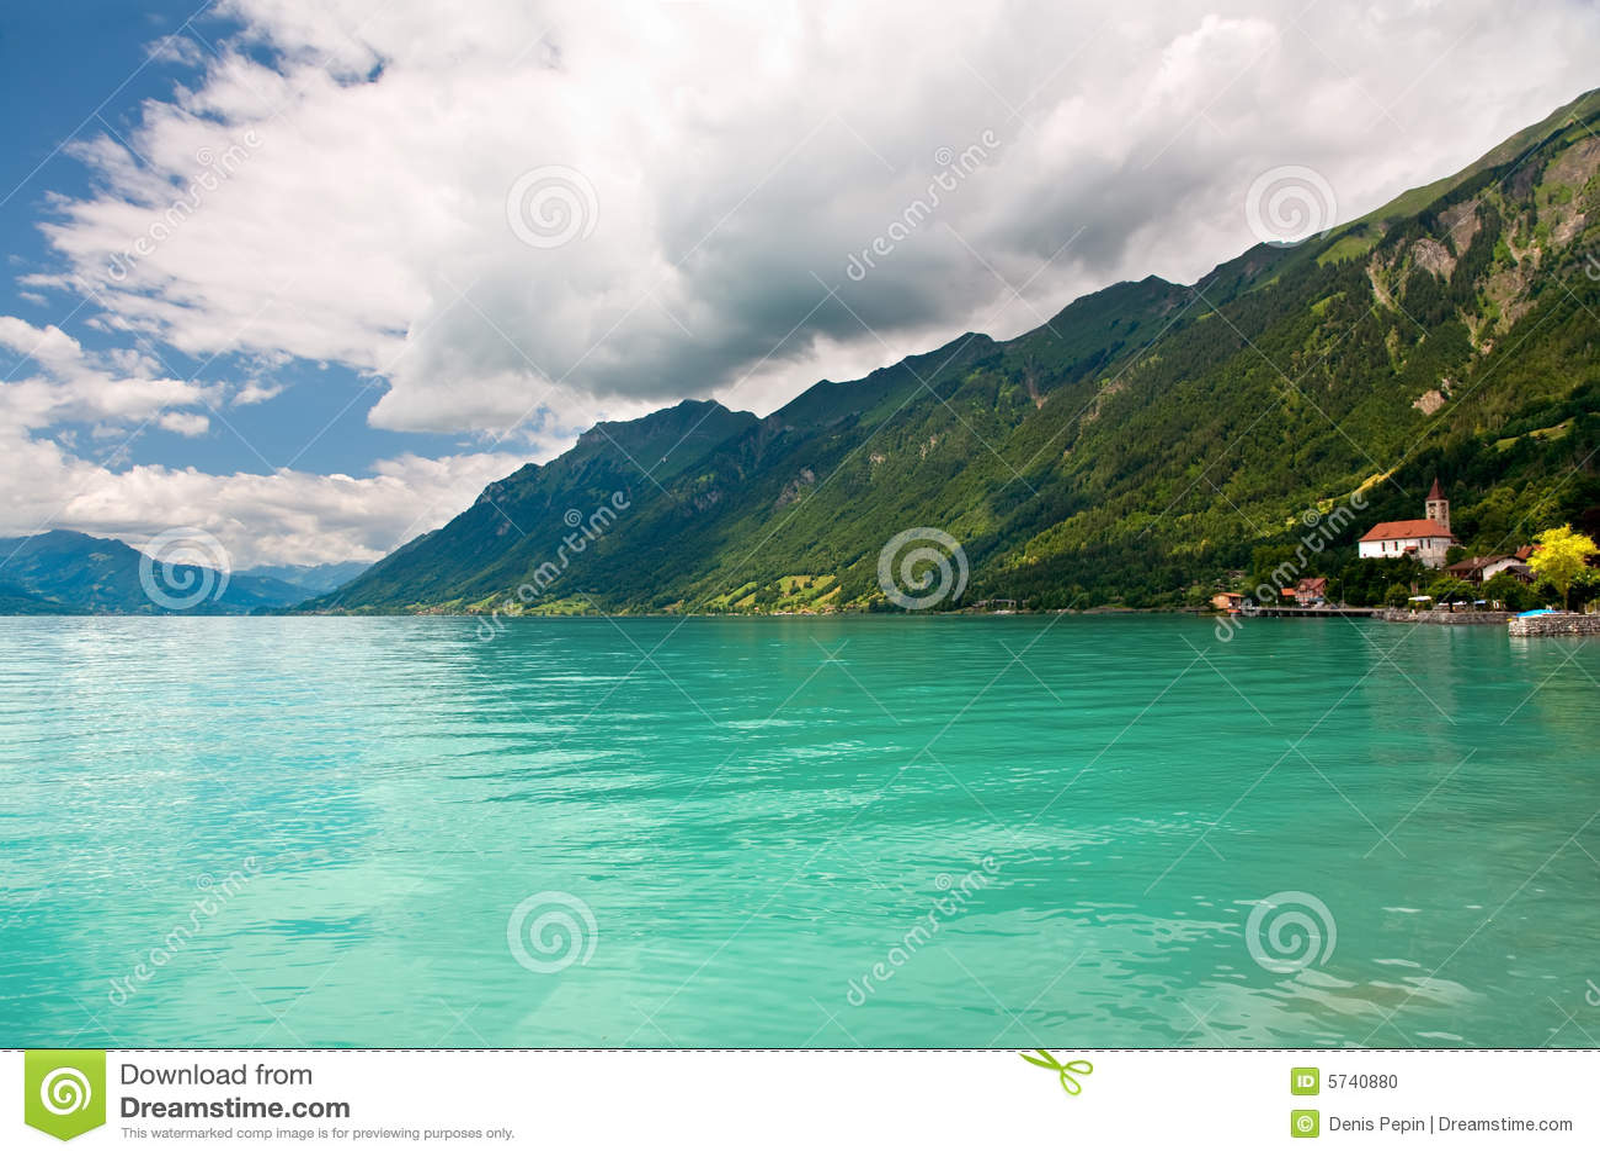 Lake Brienz, Berne Canton, Switzerland